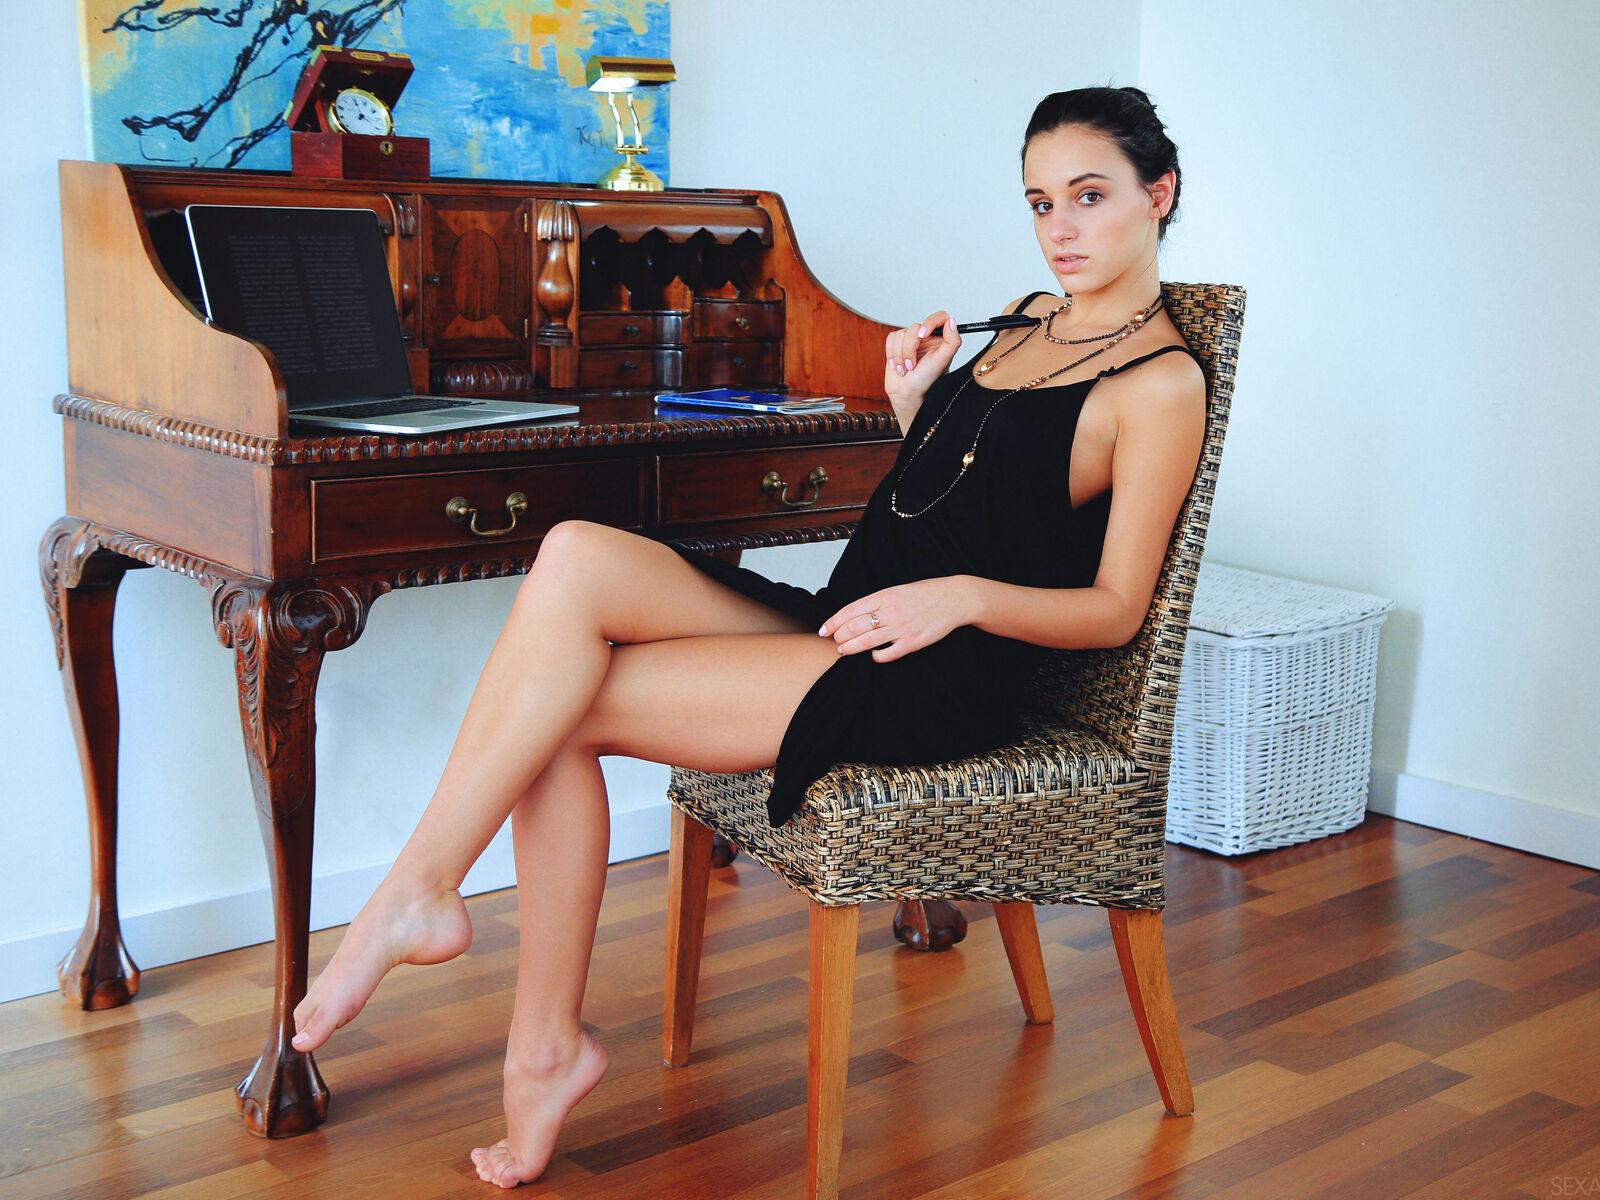 black-dress-sitting-on-chair-photoshoot-vx.jpg